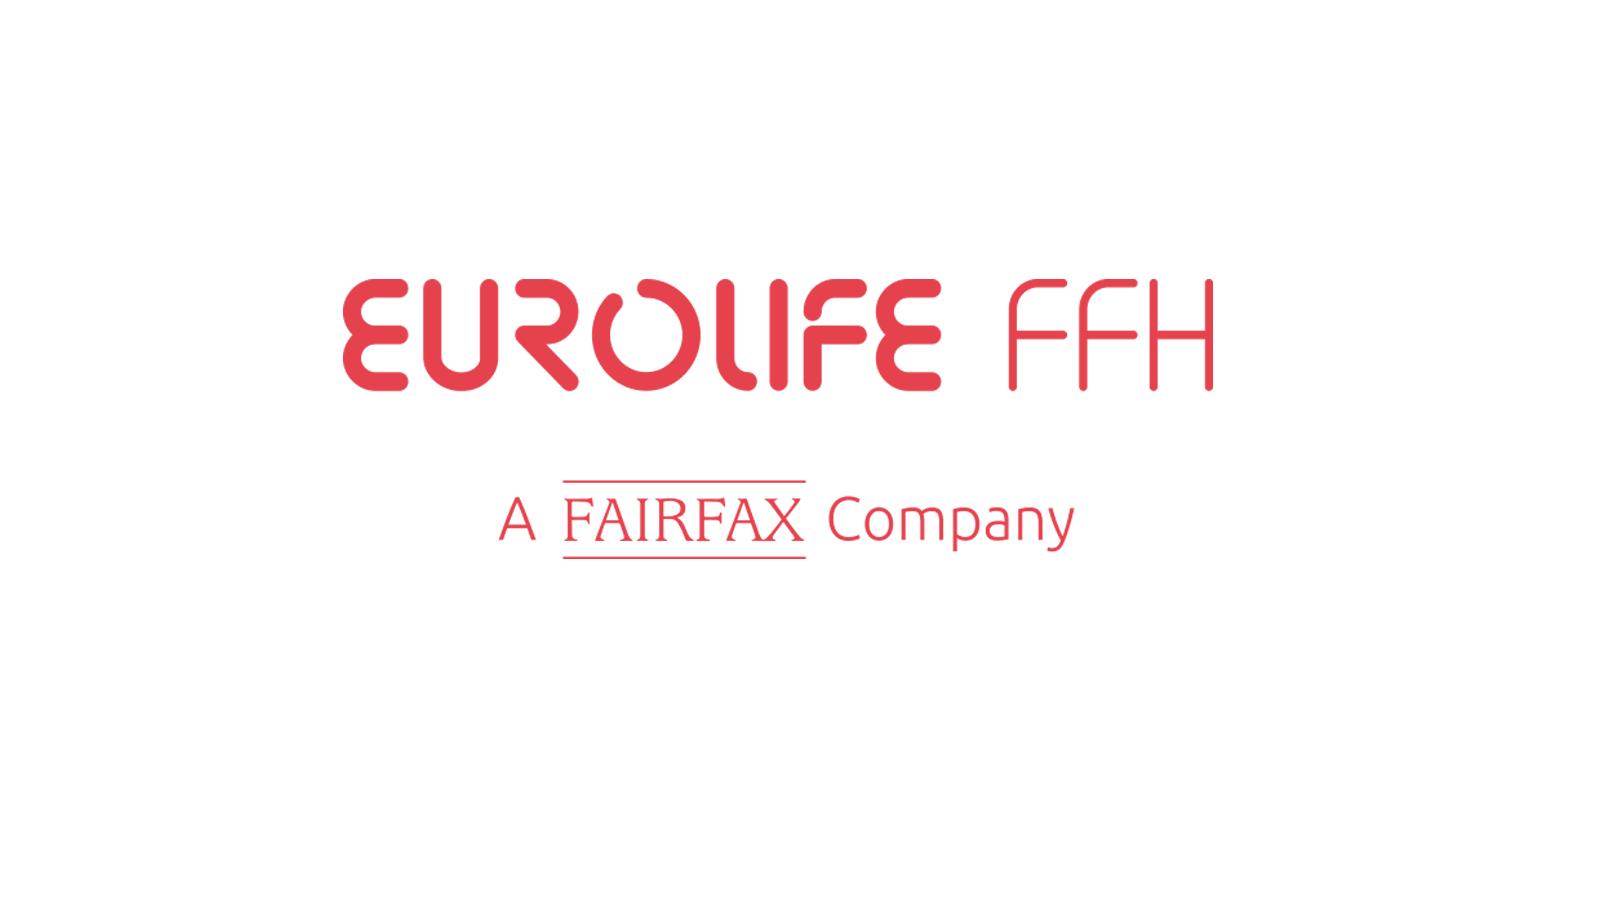 Eurolife FFH: Νέα υπηρεσία άμεσης αποζημίωσης κατοικίας